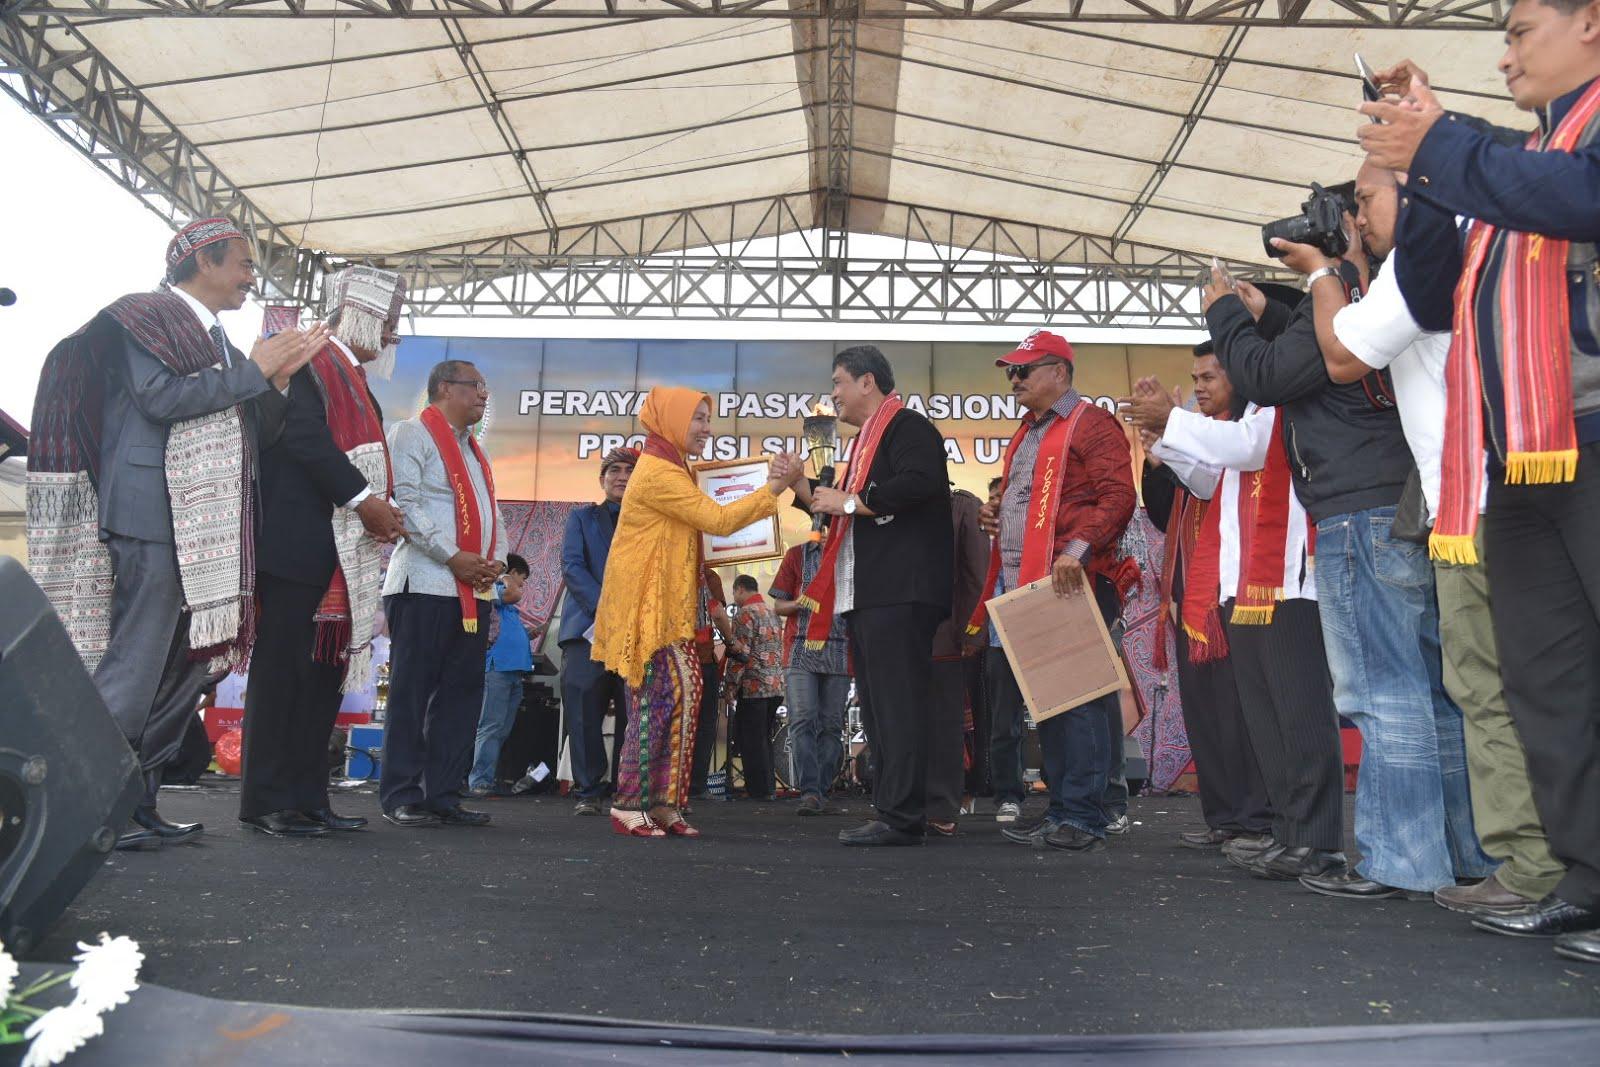 Paskah Nasional Tahun 2018, Wagubsu Ajak Masyarakat Jaga Persaudaraan